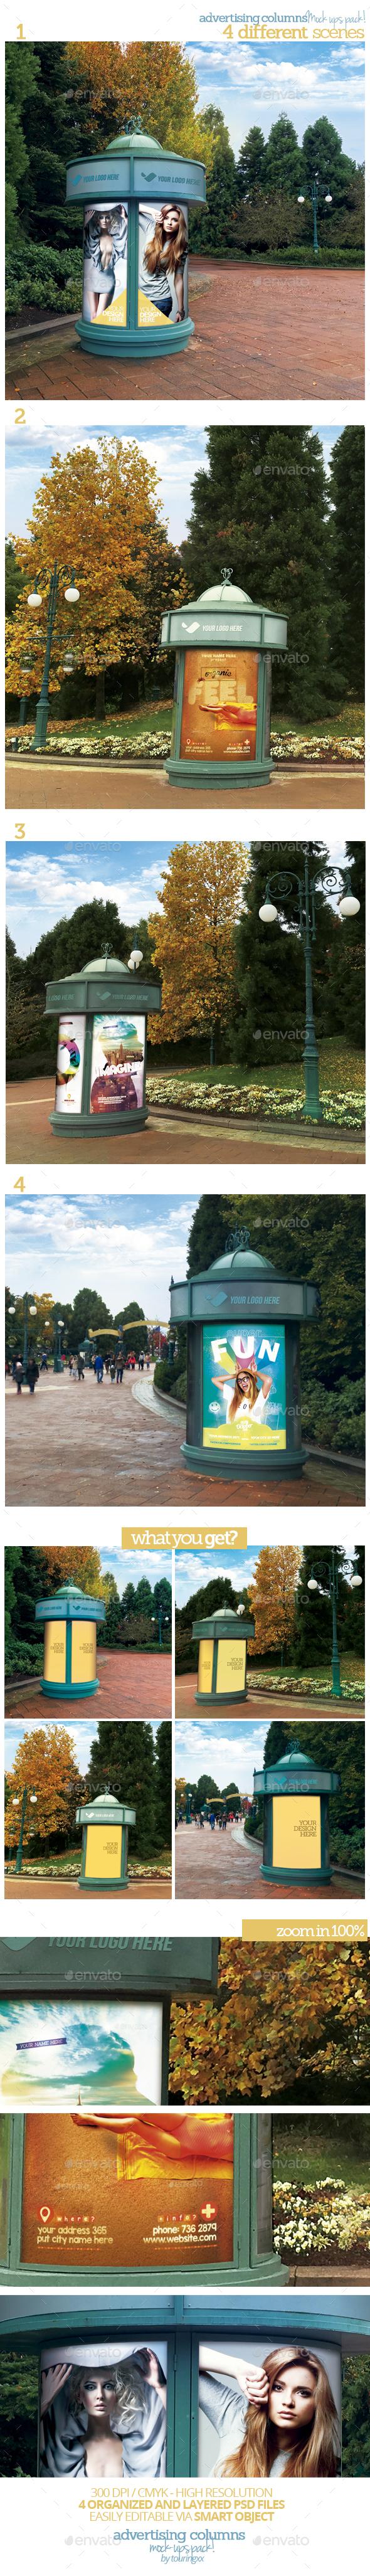 Advertising Columns Mock-Ups Pack - Posters Print